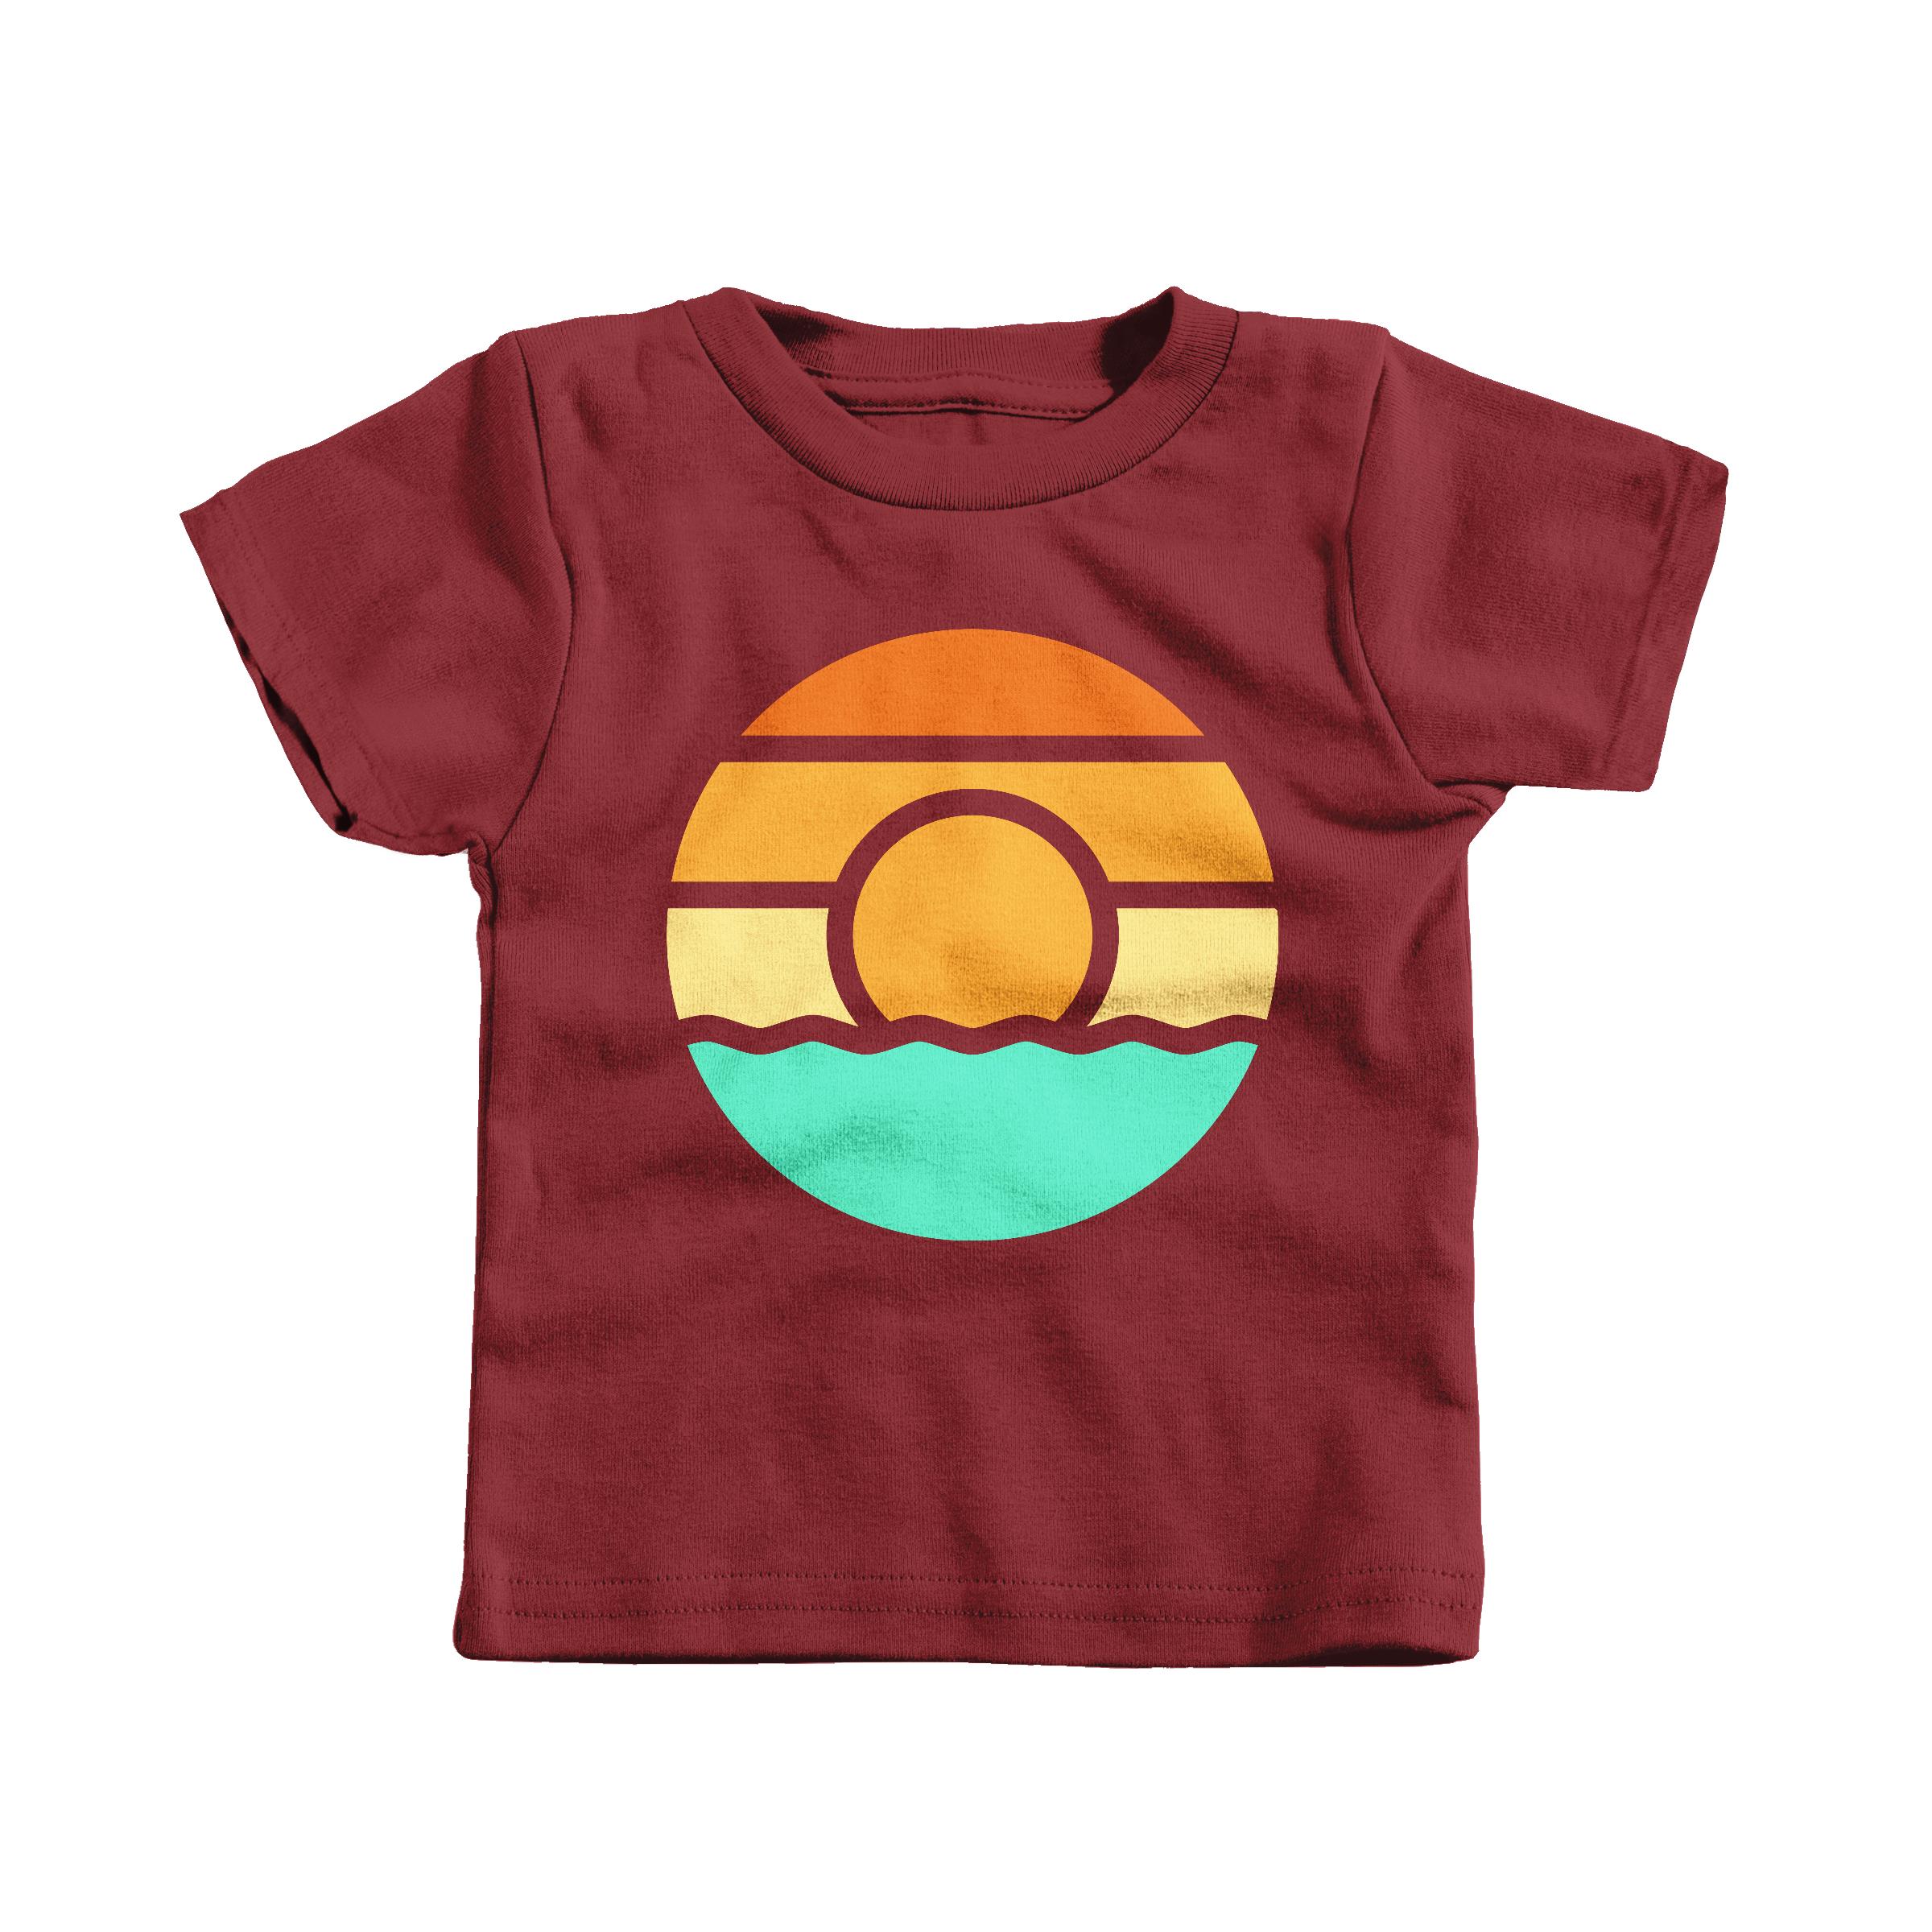 Lake Sunset Garnet (T-Shirt)